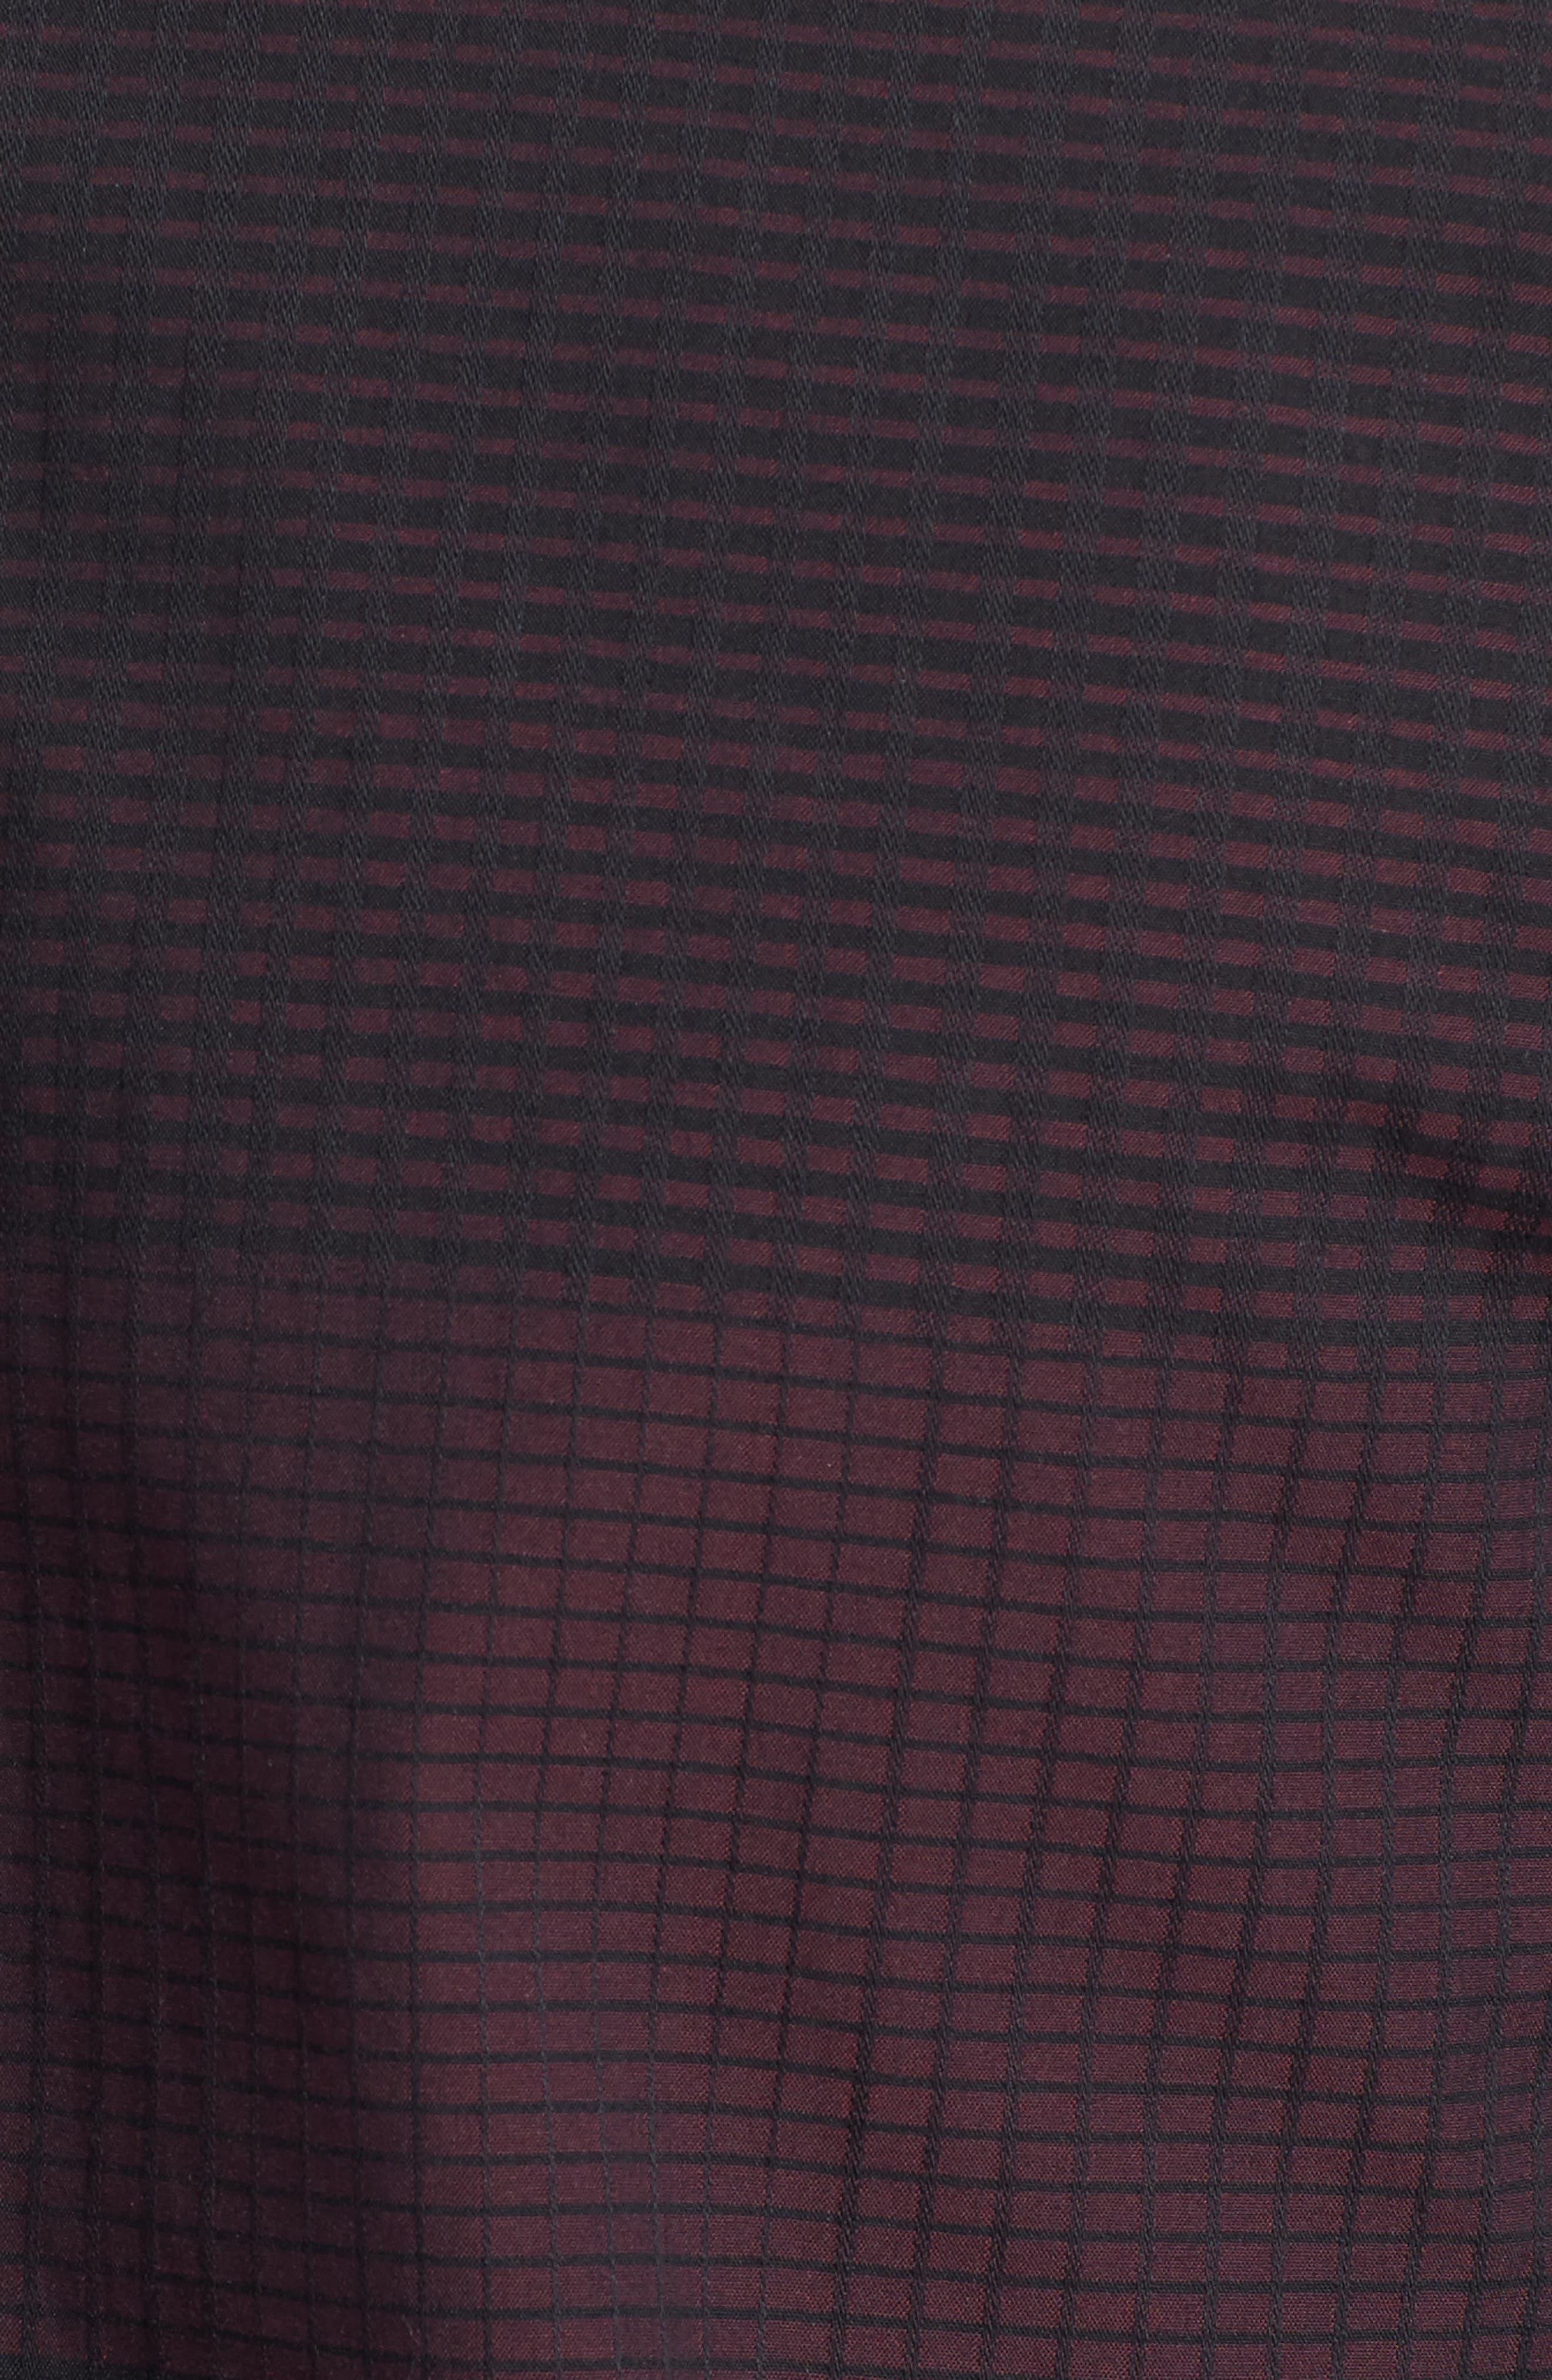 Slim Fit Check Plaid Sport Shirt,                             Alternate thumbnail 5, color,                             BURGUNDY/ BLACK CHECK PLAID